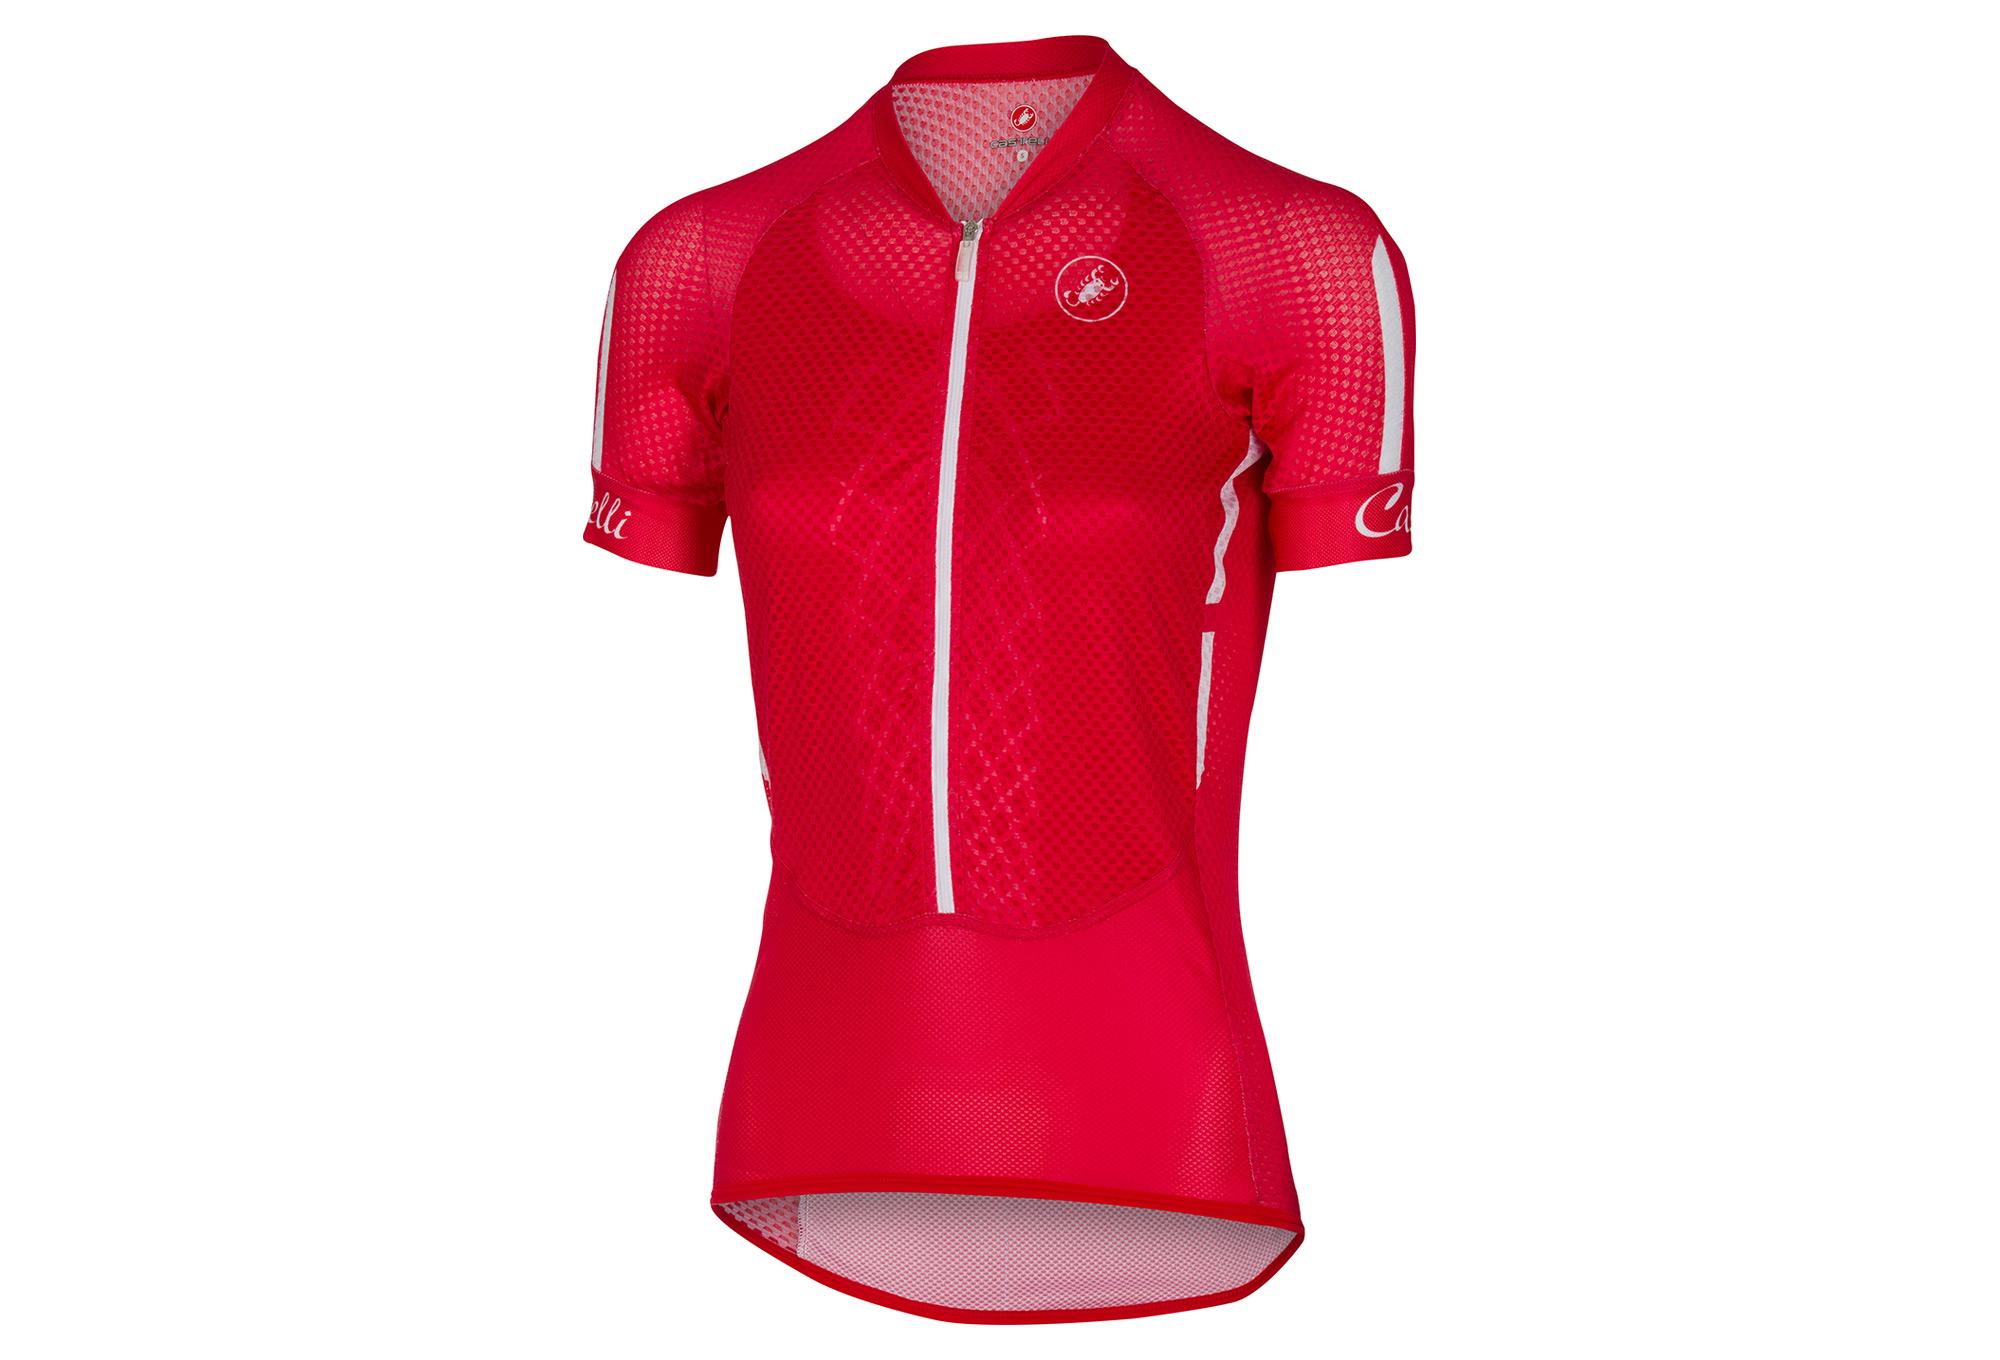 CASTELLI CLIMBER S 2.0 Women s Short Sleeves Jersey Red White Black ... 786bab9b1